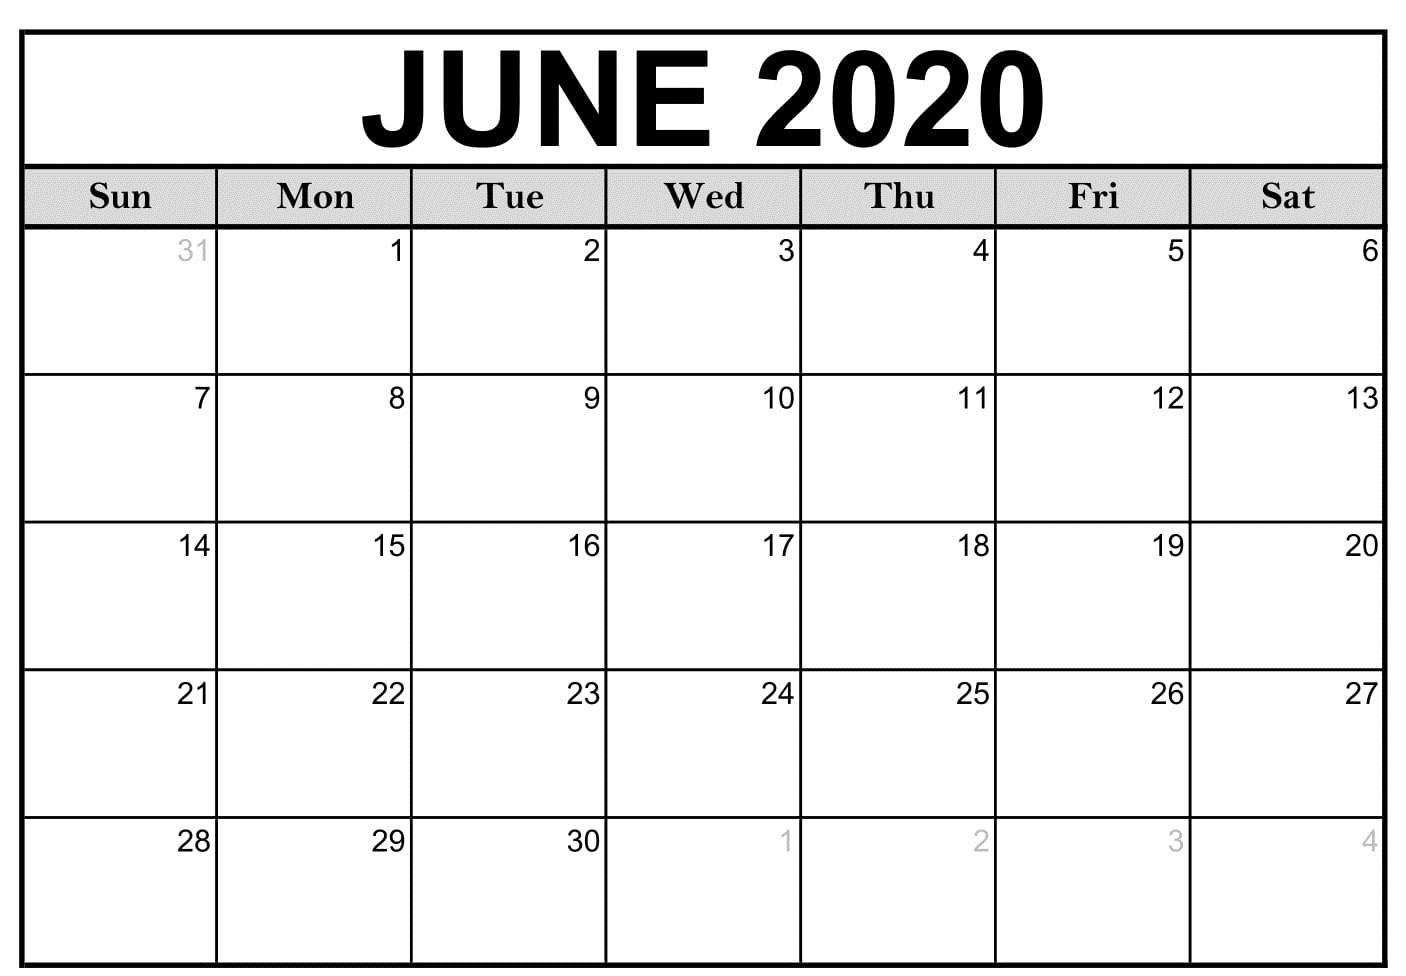 June 2020 Calendar Printable For Kids